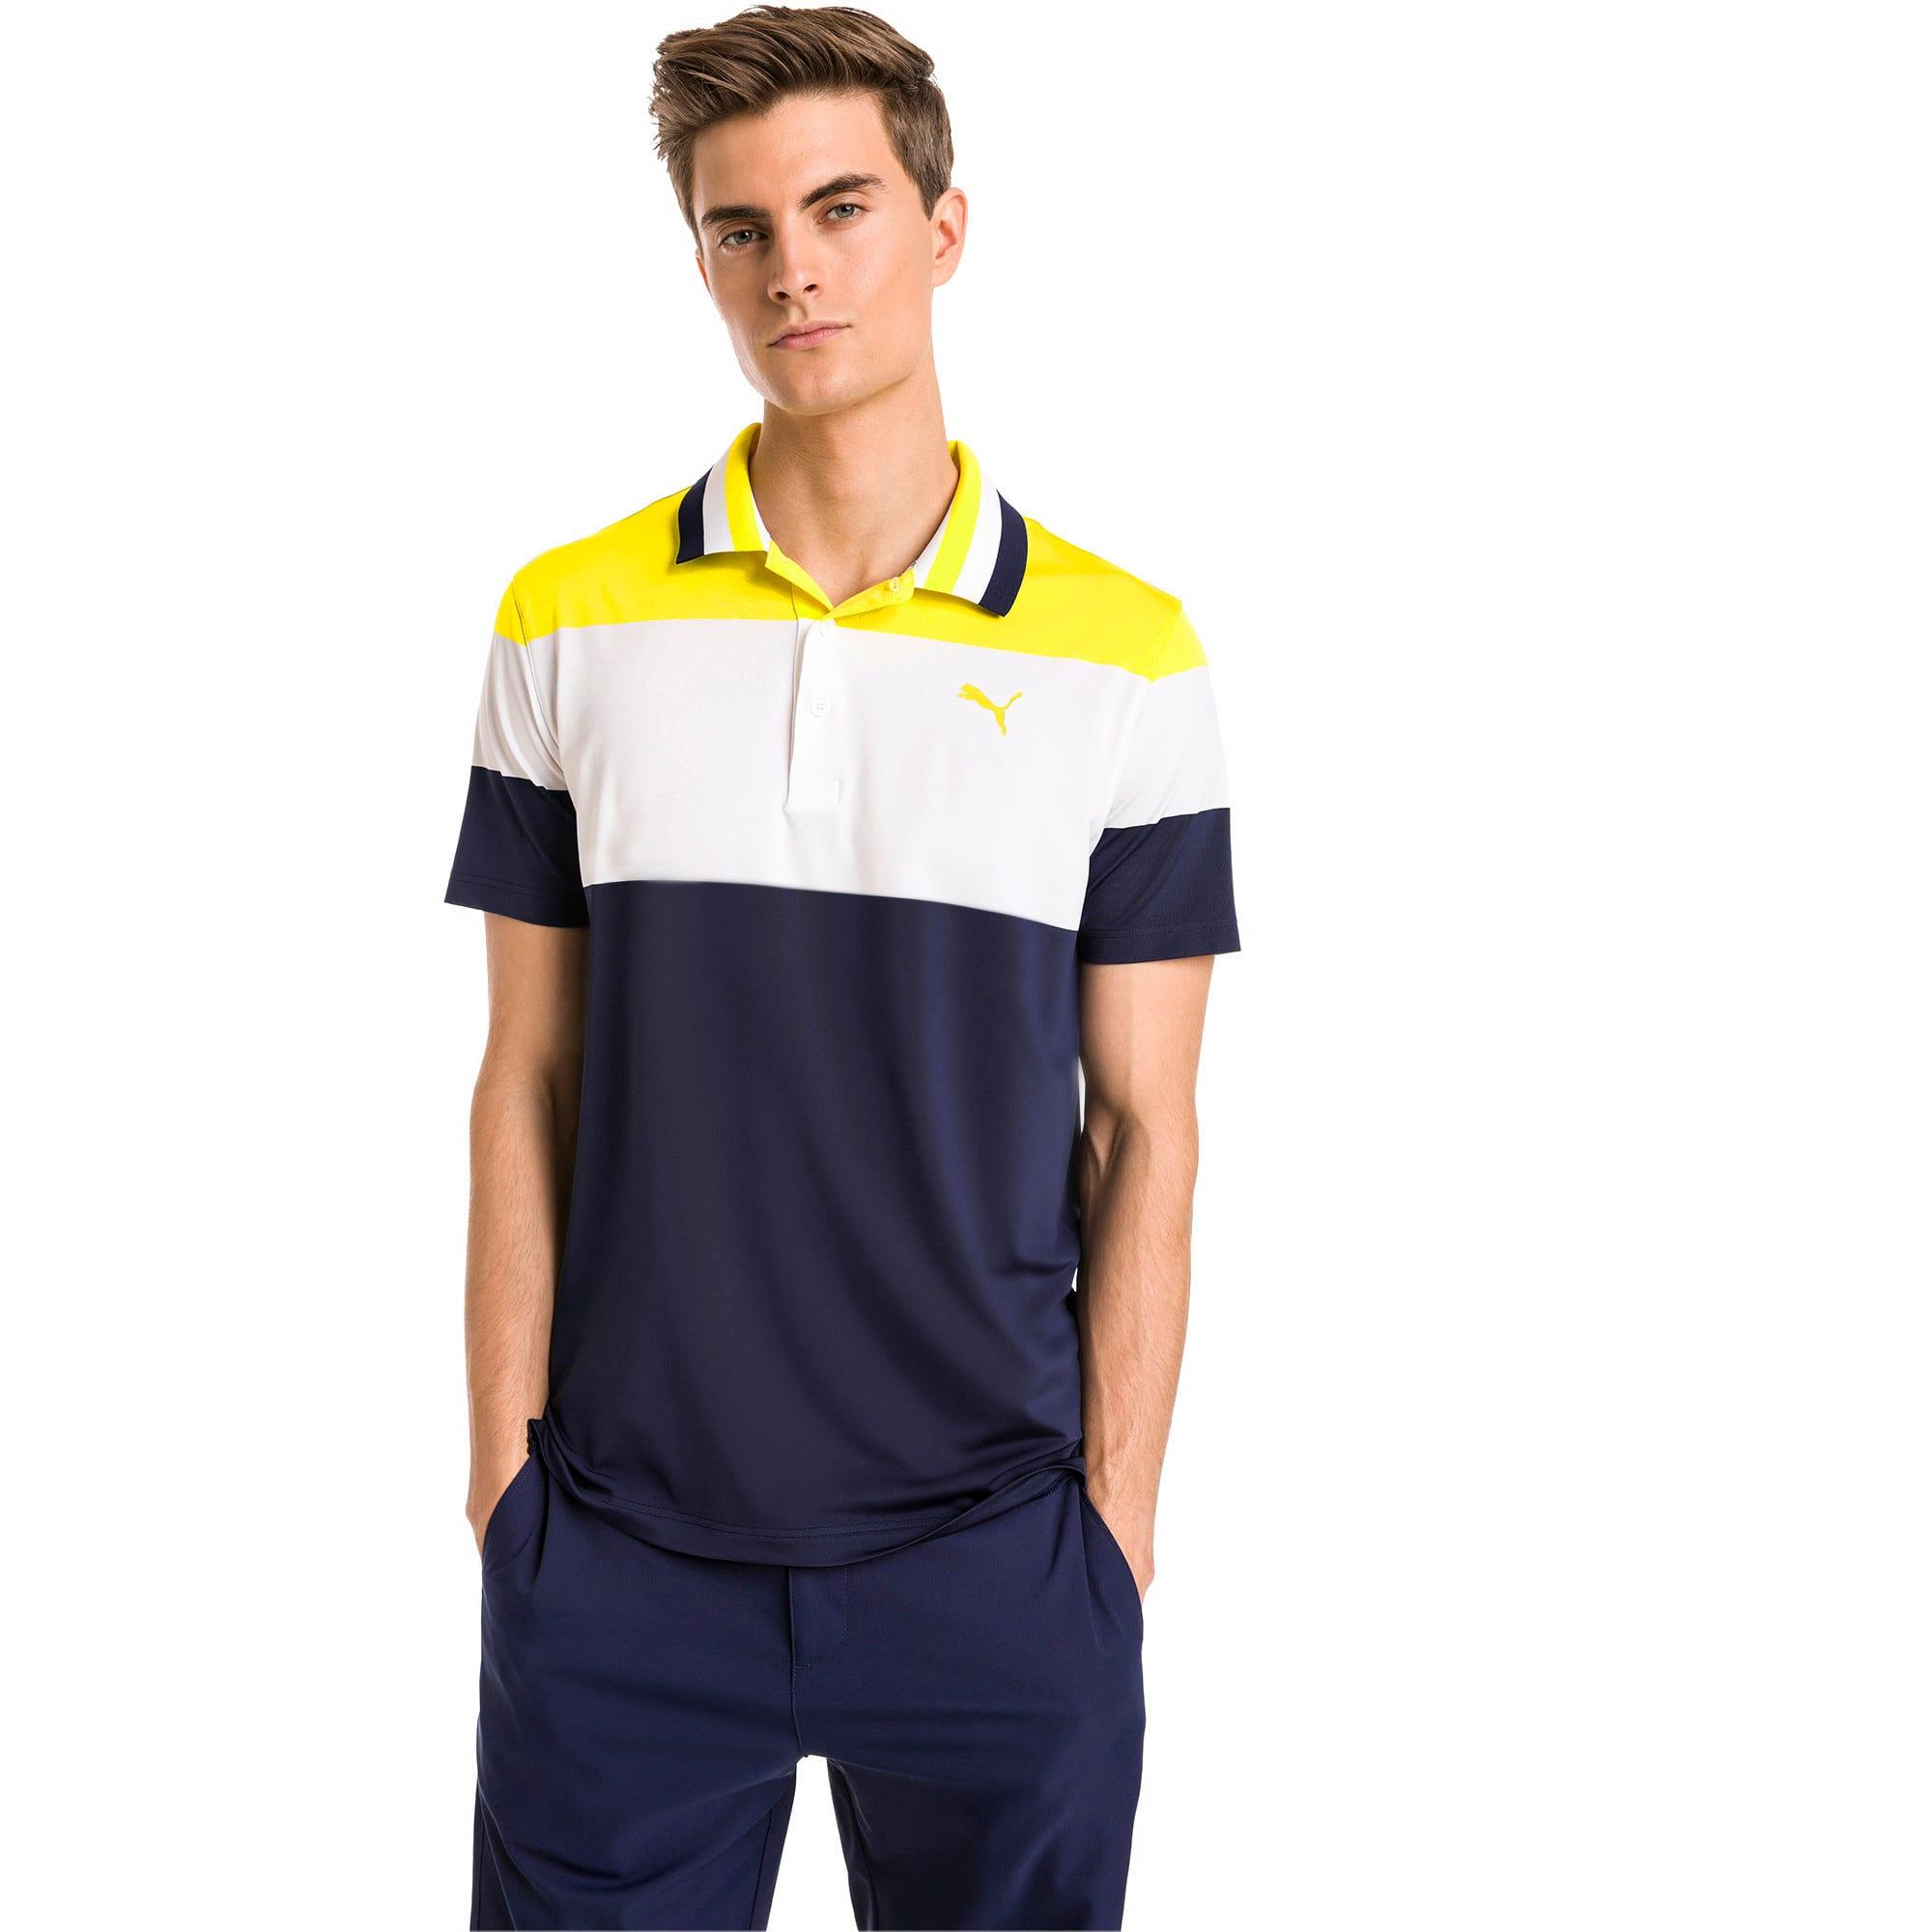 Thumbnail 1 of Nineties Men's Golf Polo, Blazing Yellow, medium